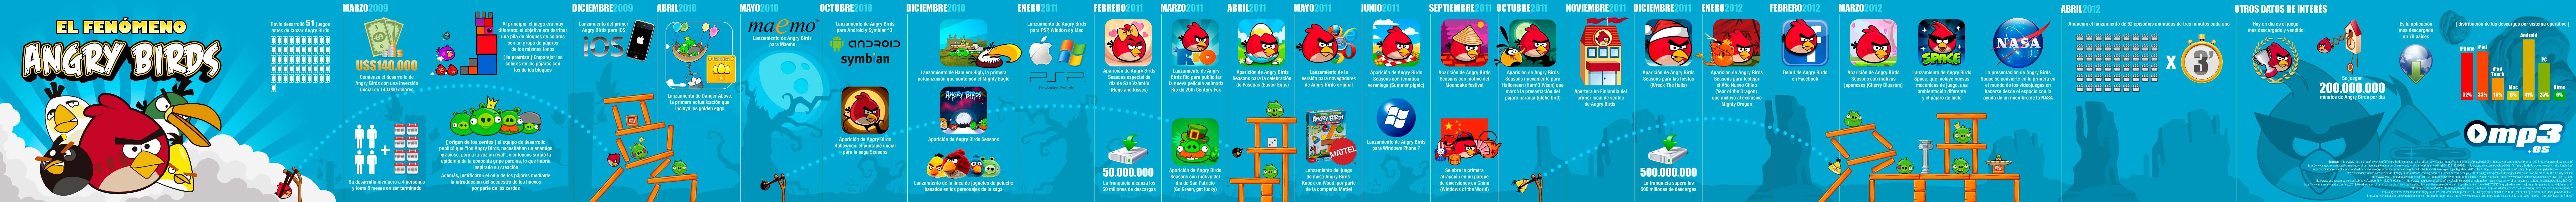 Linea De Tiempo Del Fenomeno Angry Birds Infografia